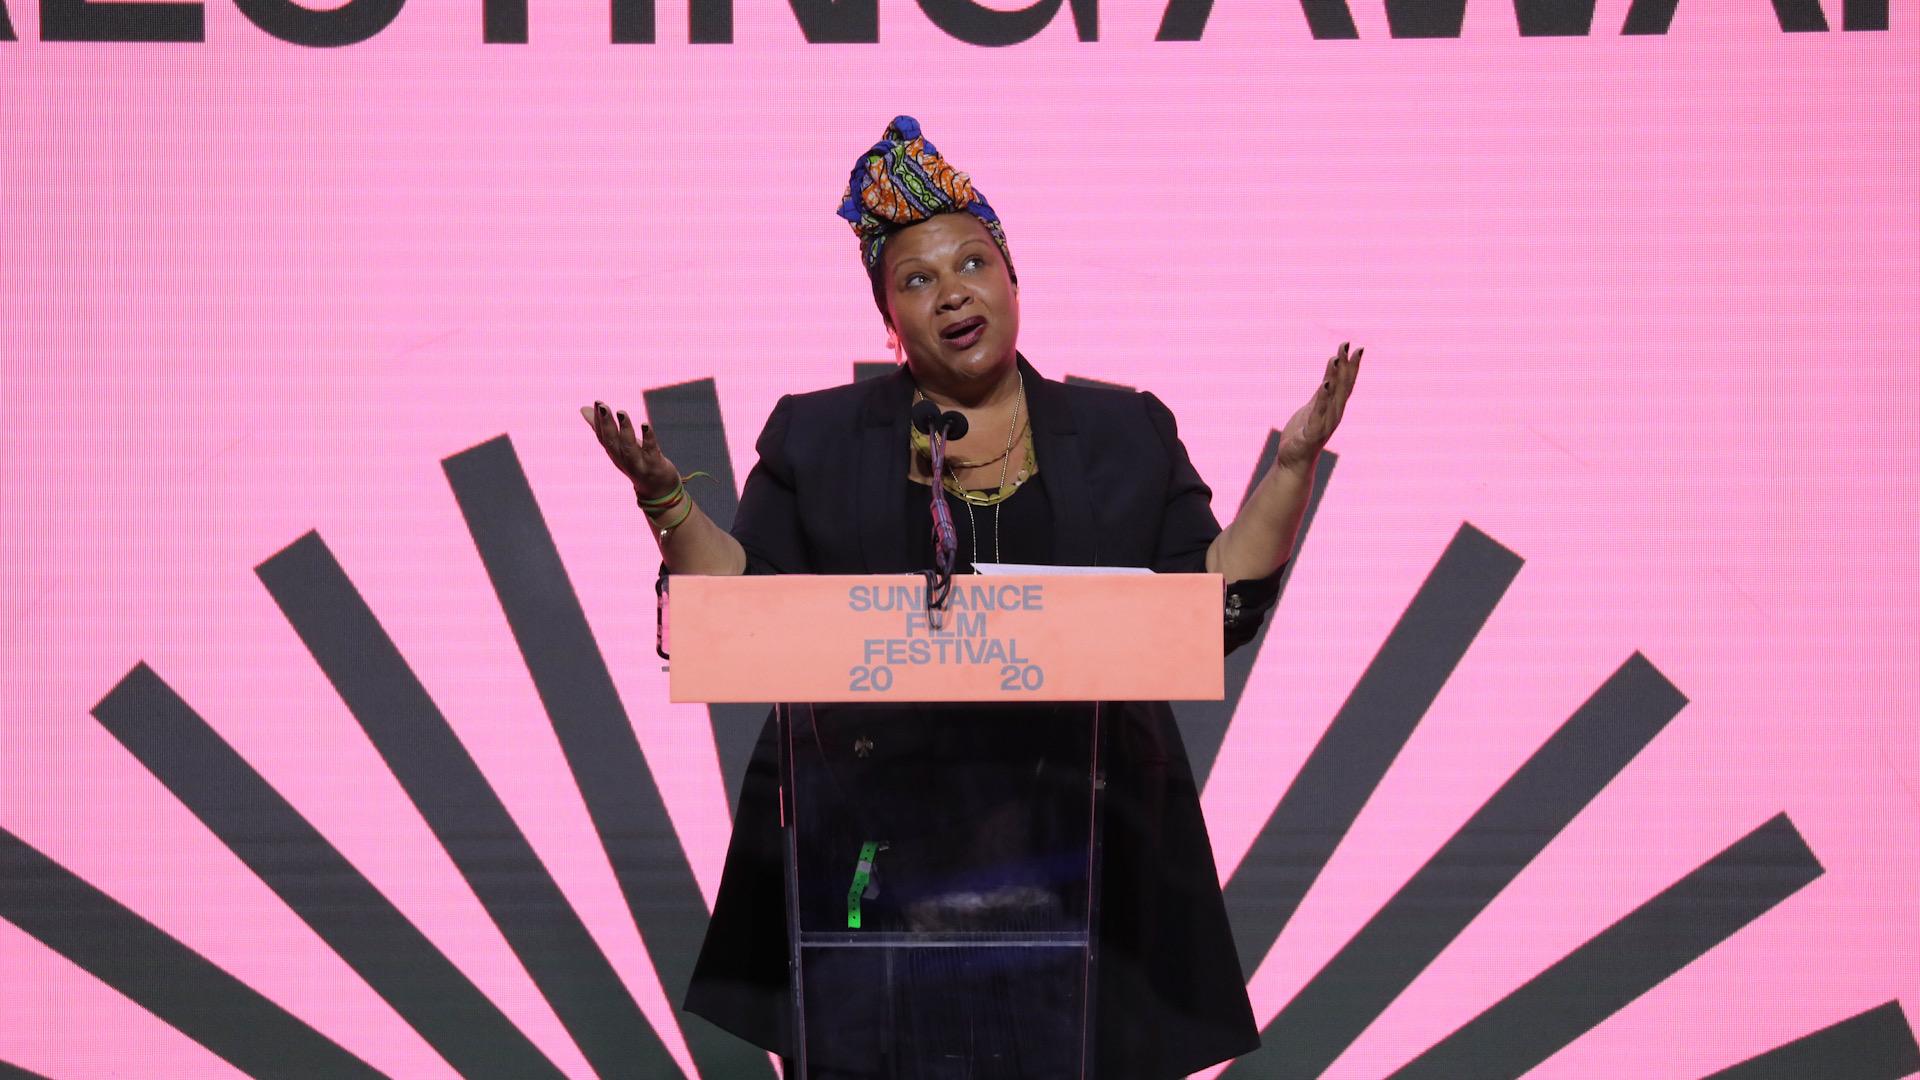 Sundance 2020: todo el festival de un pantallazo